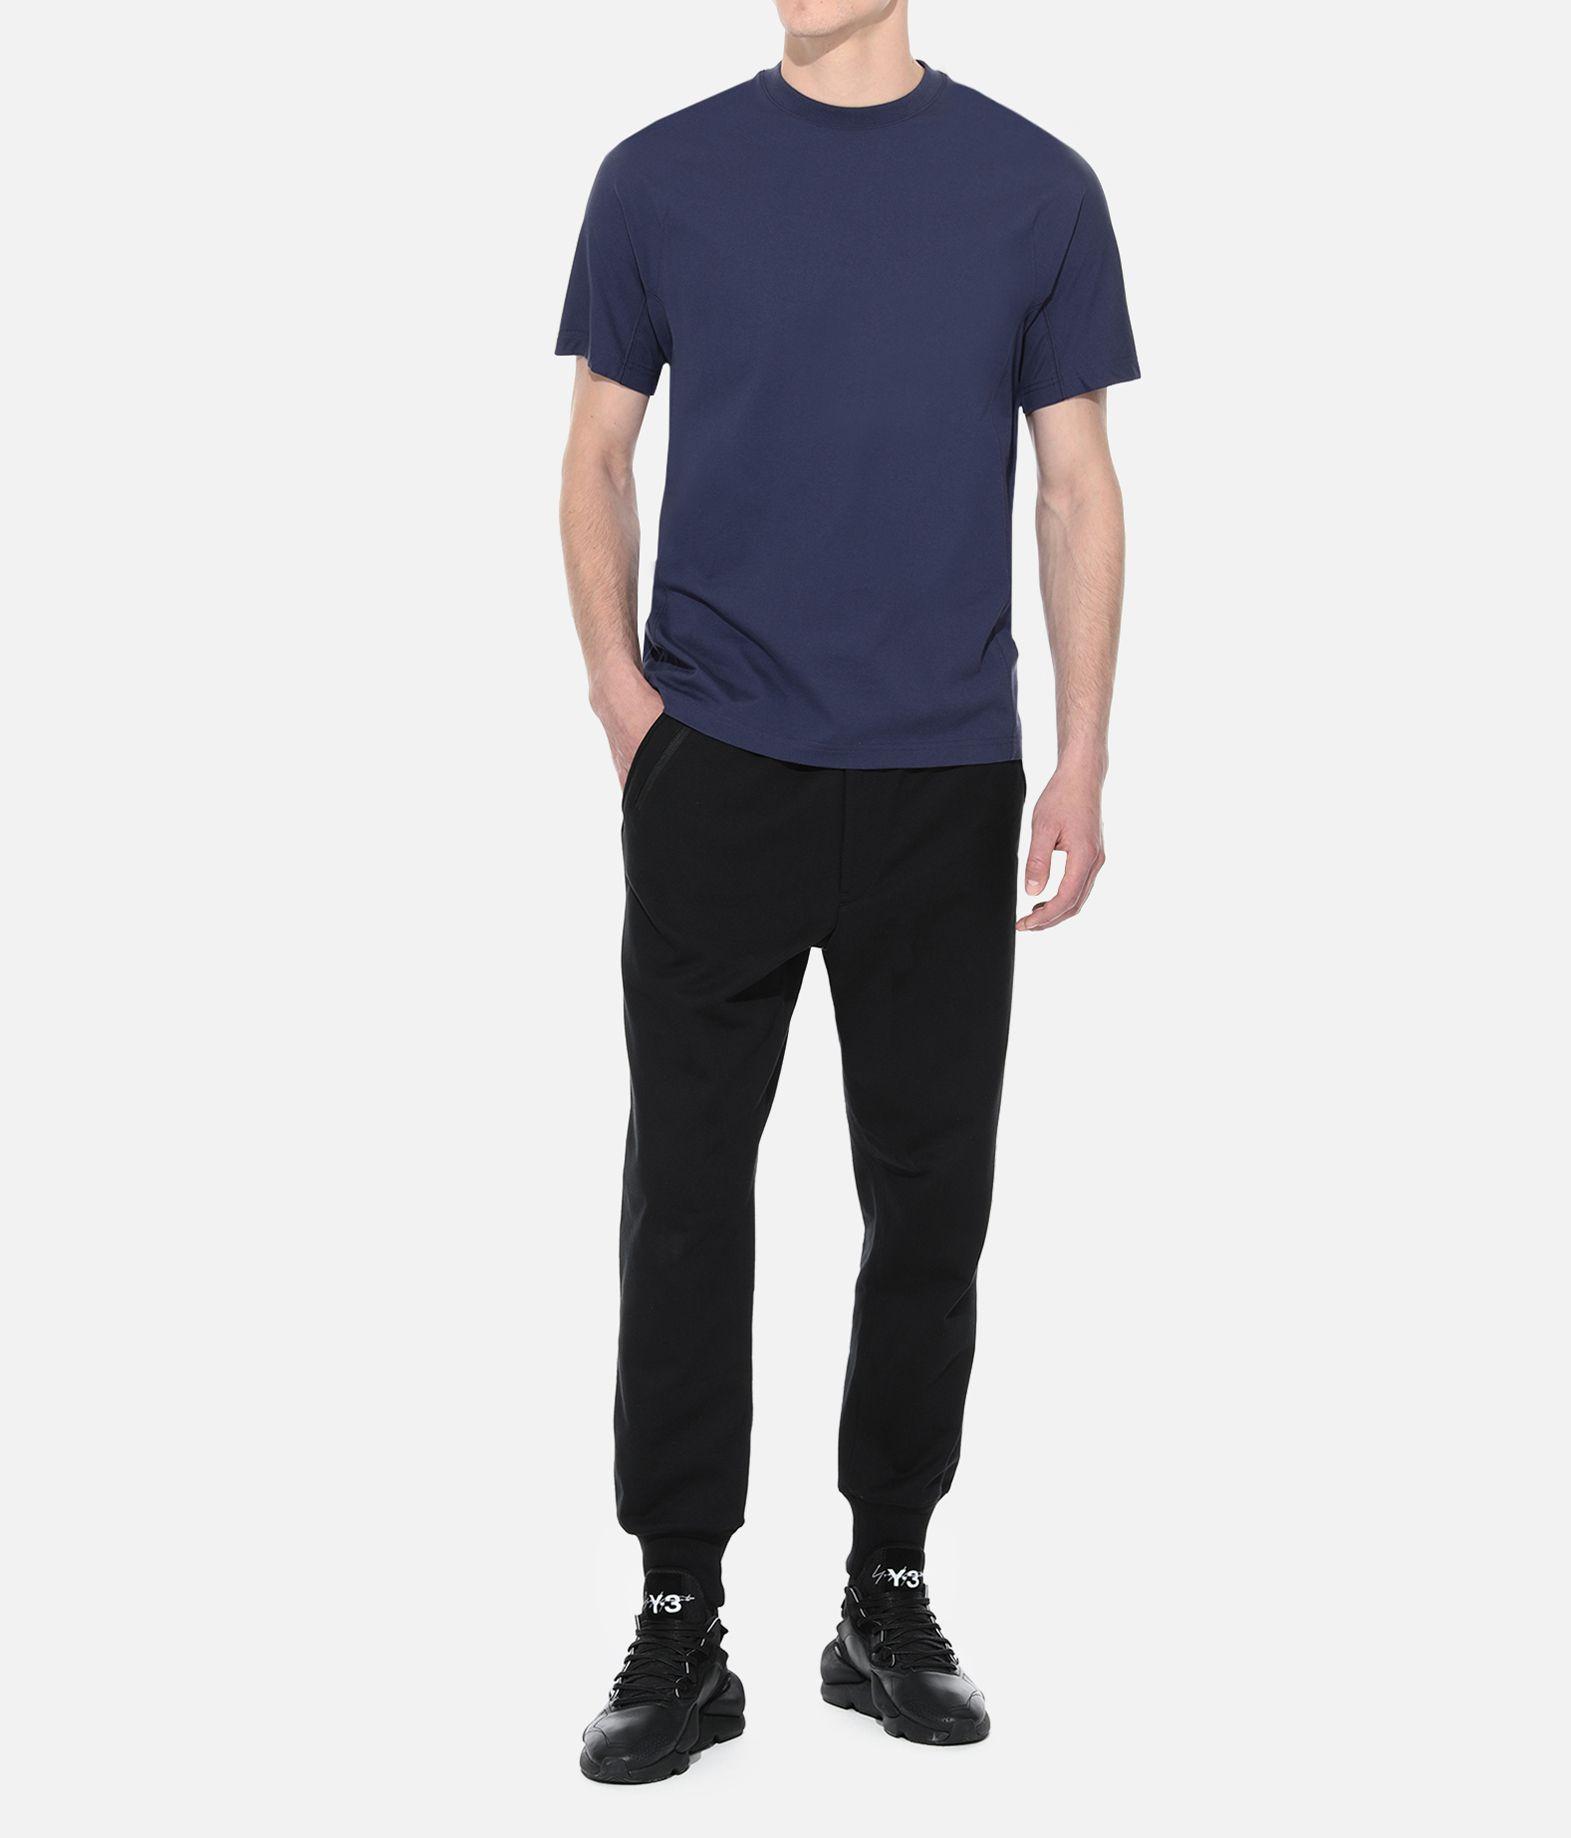 Y-3 Y-3 Classic Crewneck Tee Short sleeve t-shirt Man a